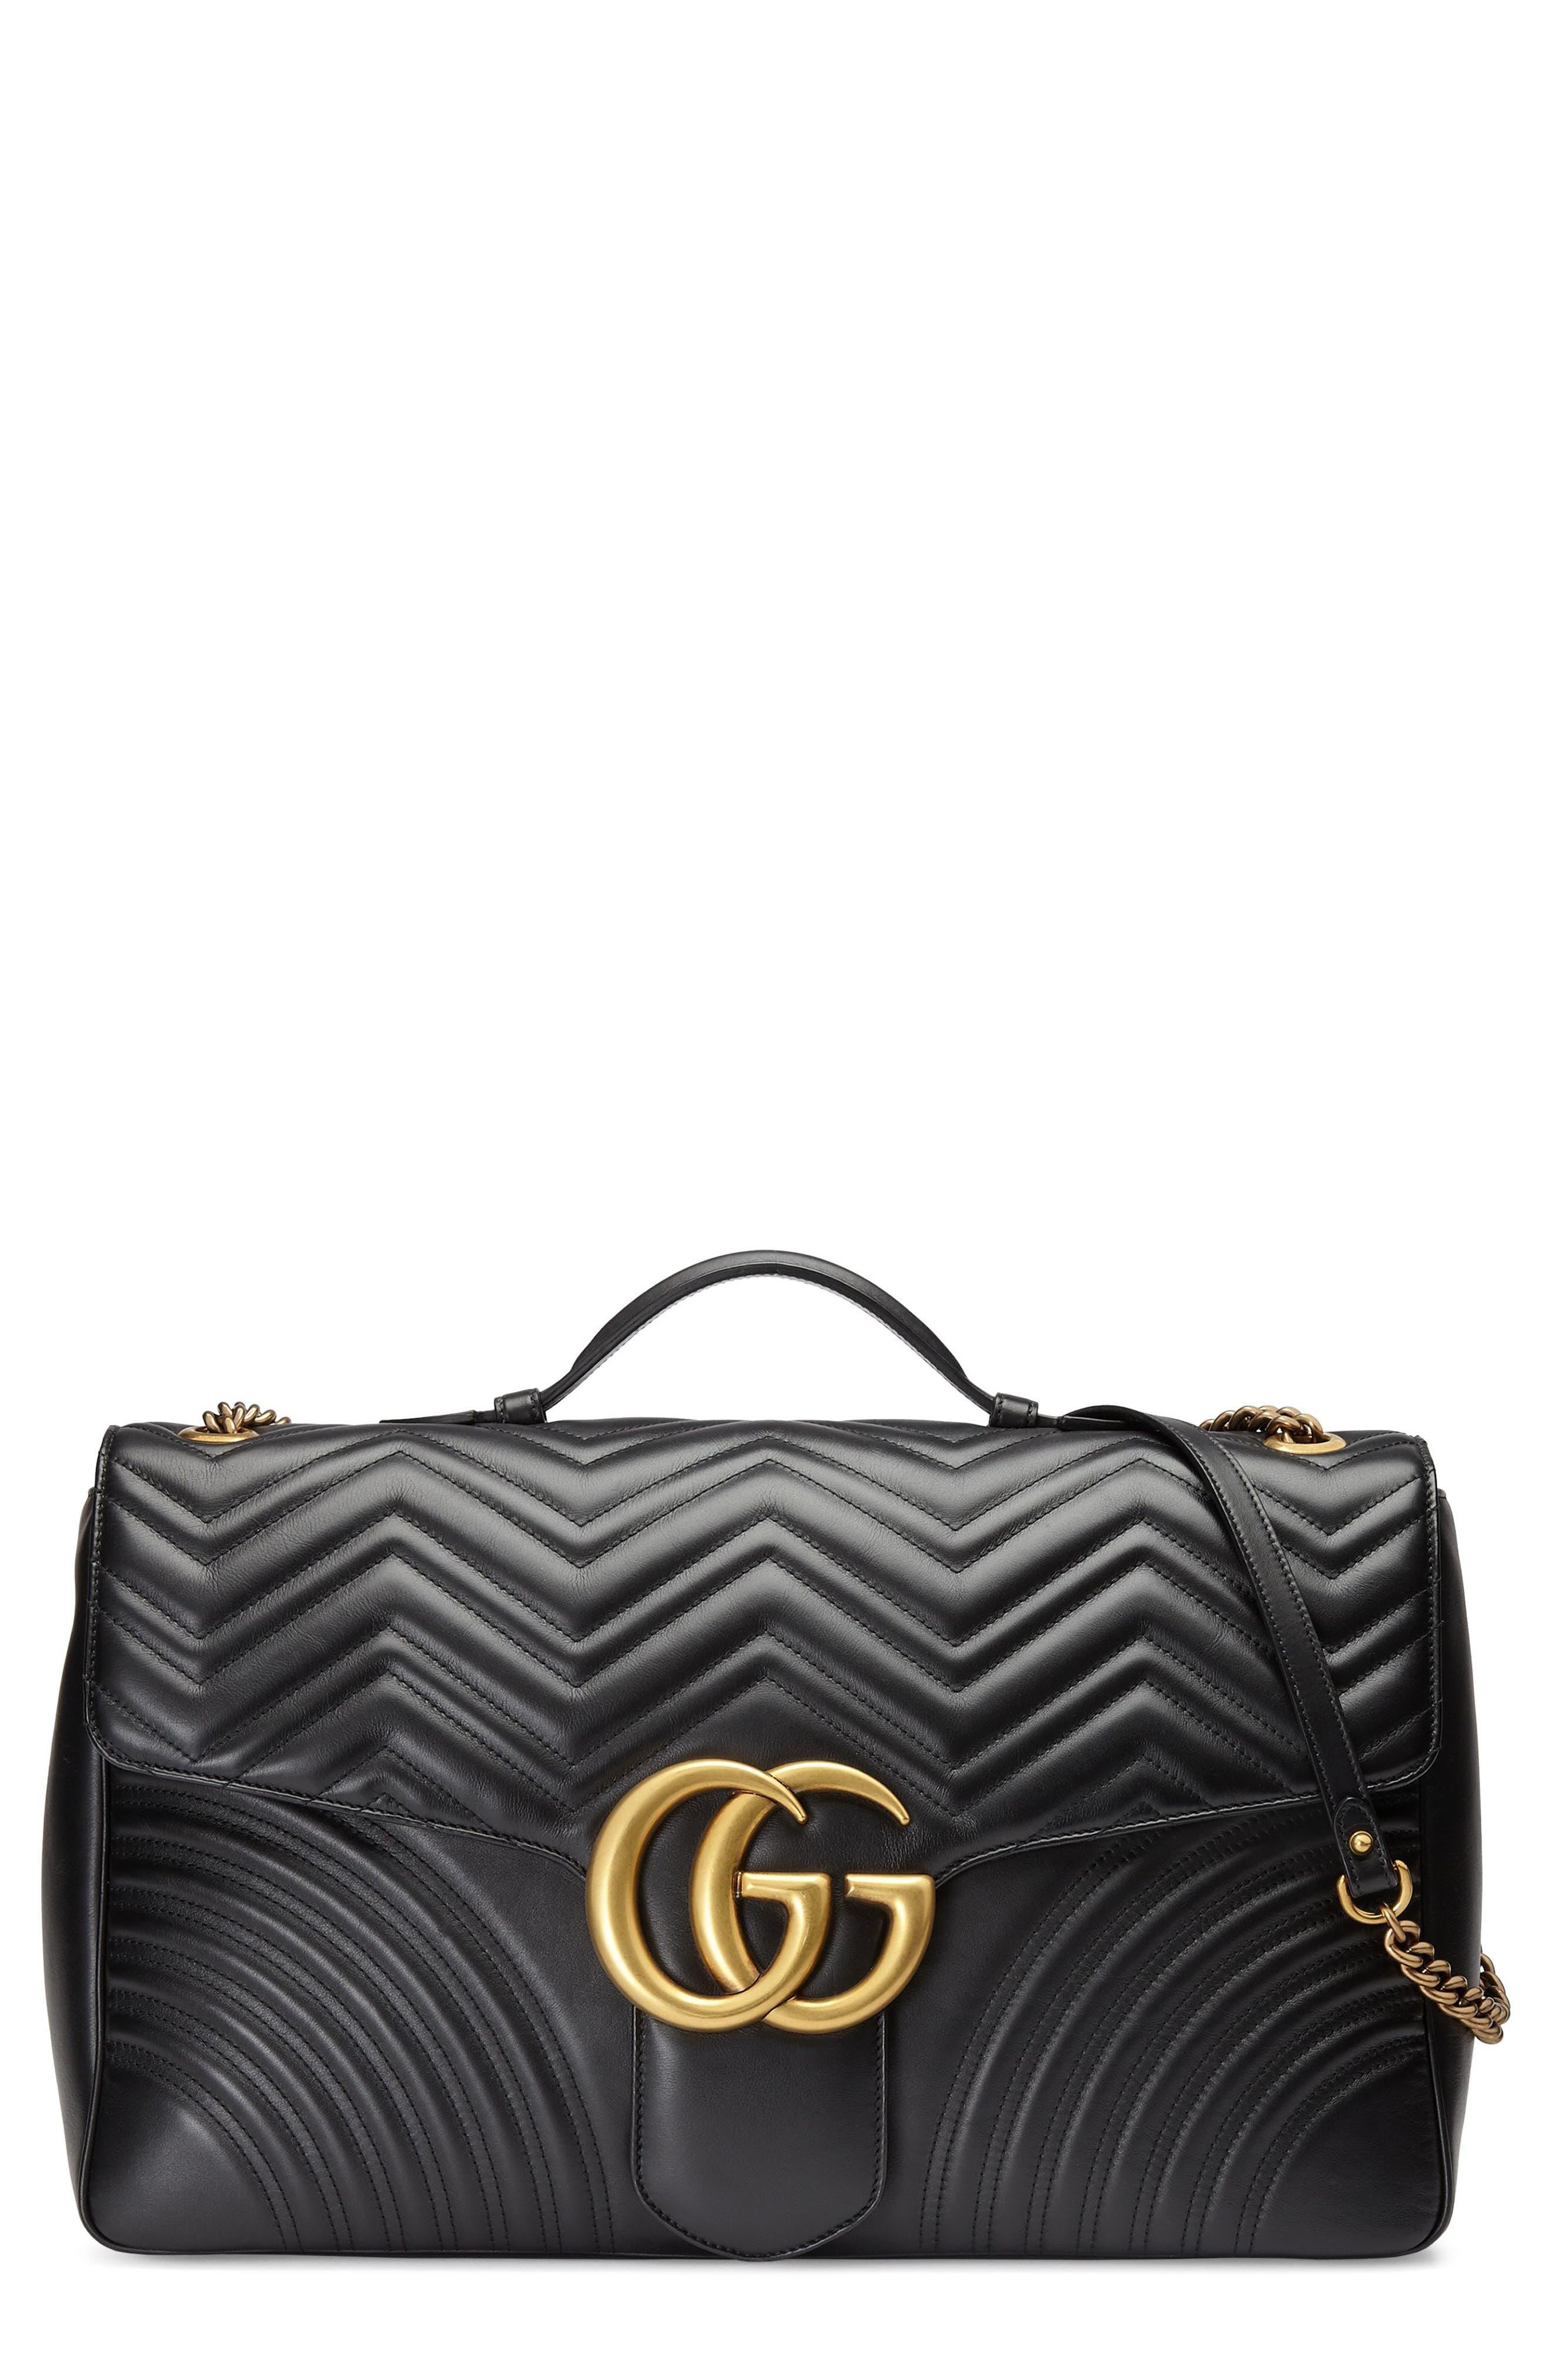 GG Marmont Maxi Matelassé Top Handle Shoulder Bag,                             Main thumbnail 1, color,                             001